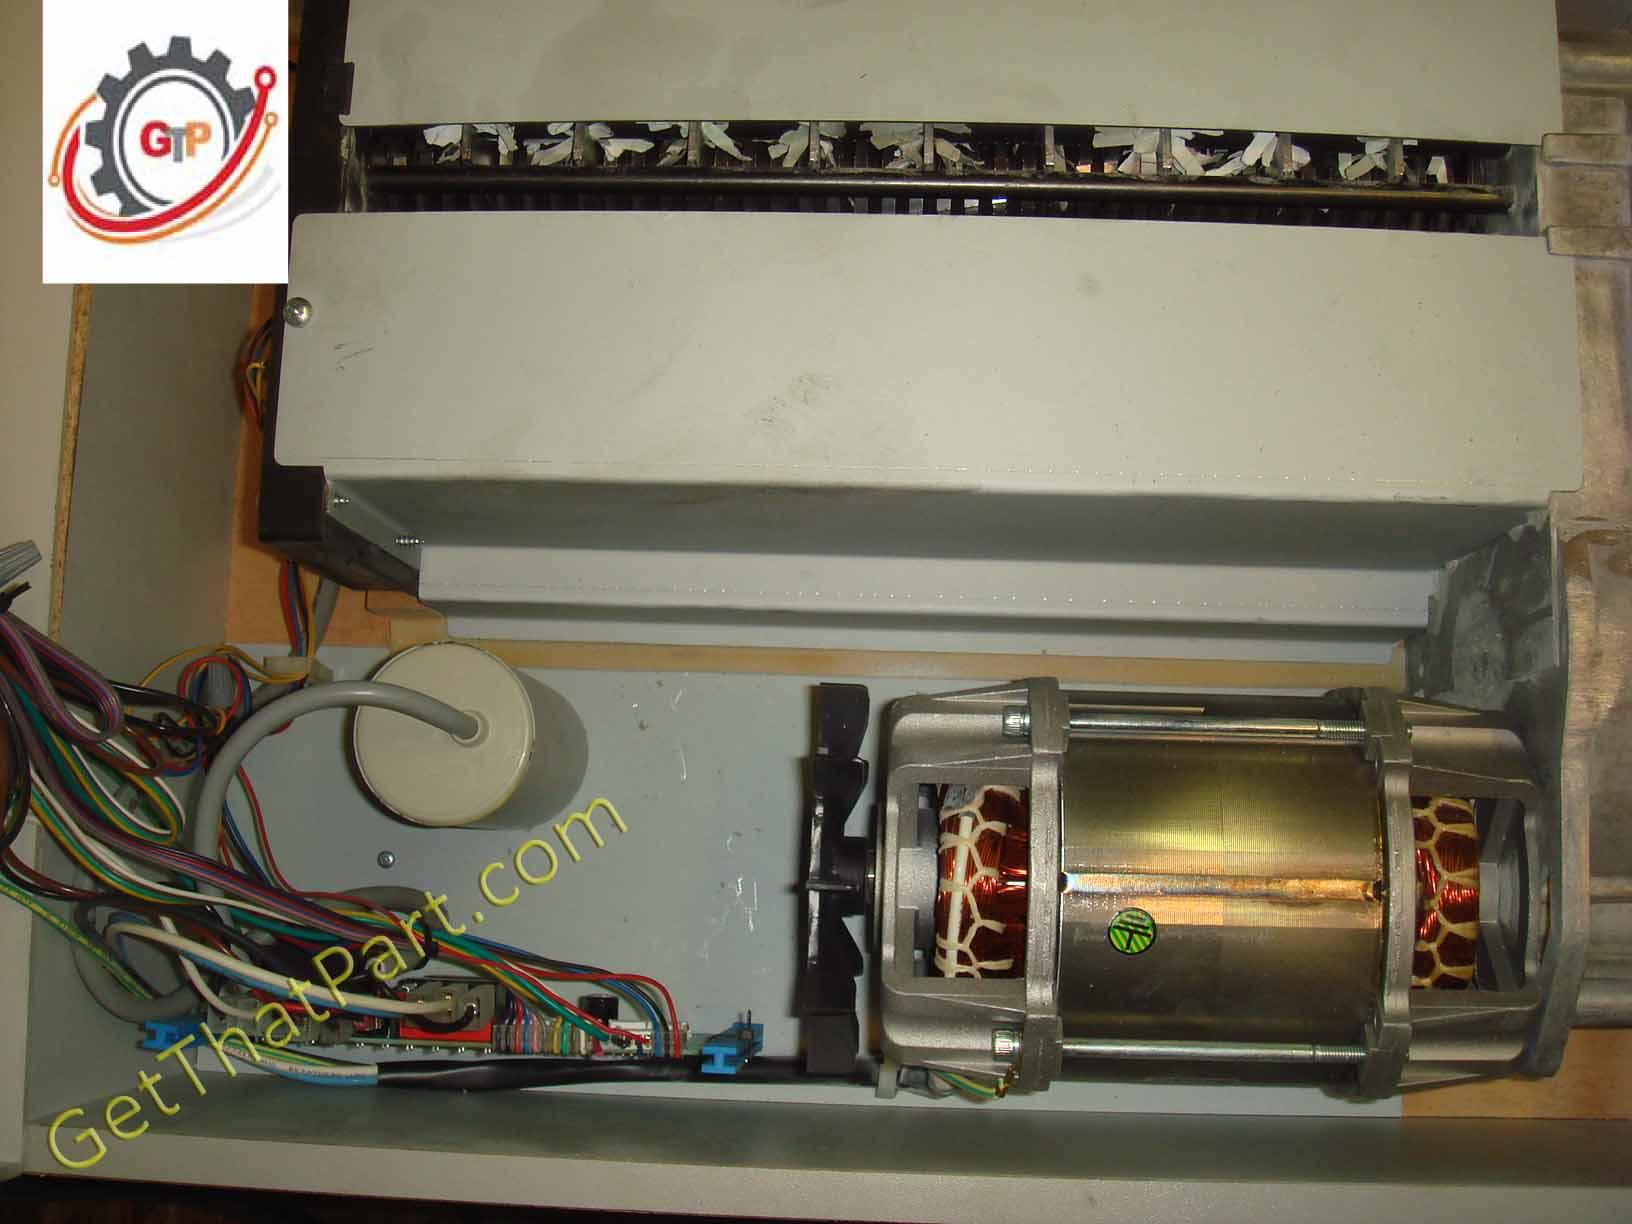 hsm 225.2 shredder manual